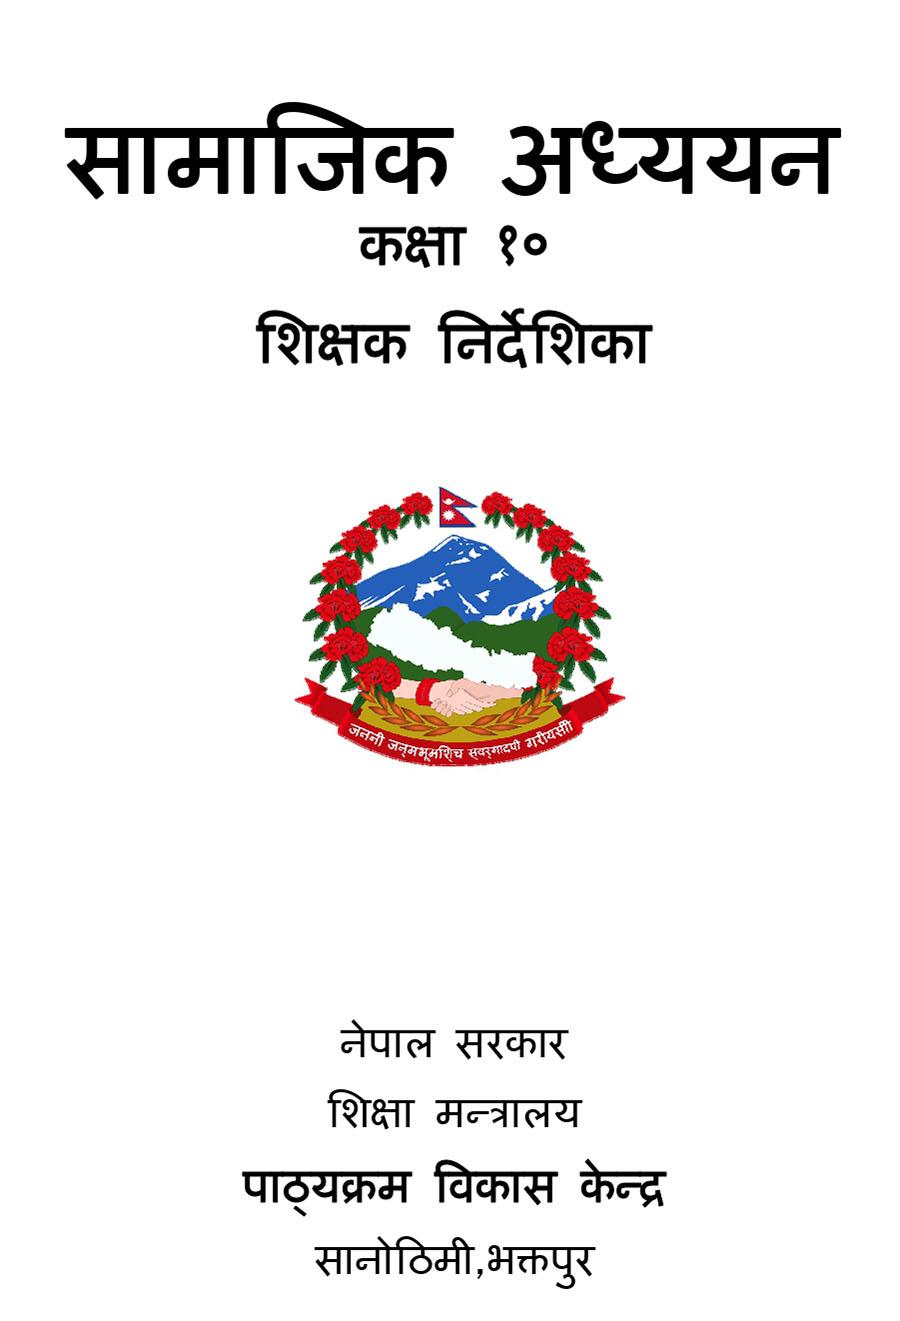 Teachers-Guide-Book-of-Compulsory-Social-Studies-Grade-10-SEE-Download-in-PDF